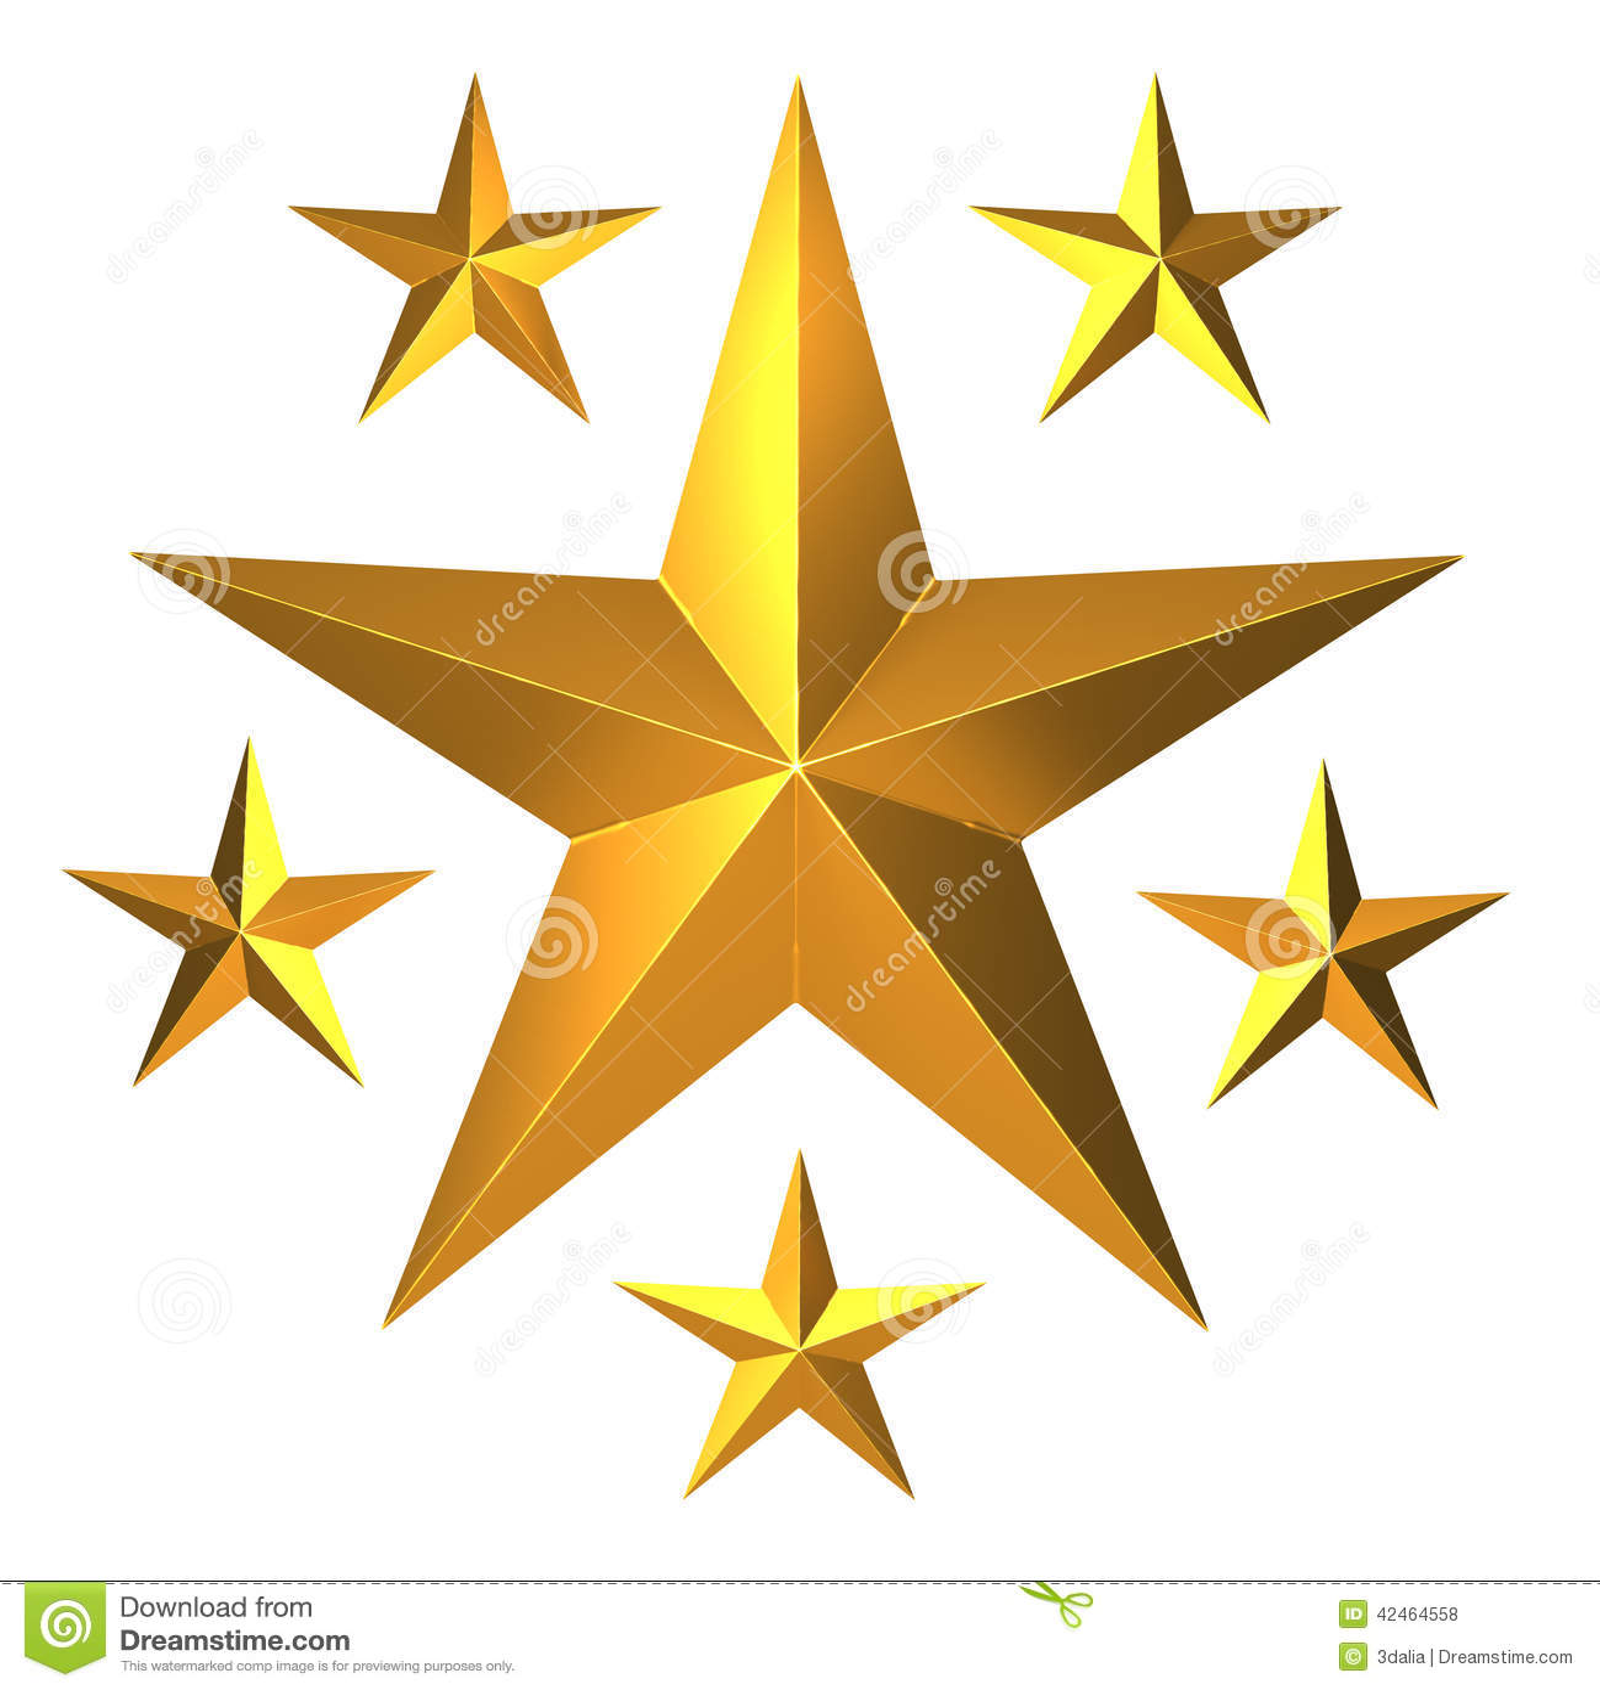 3d Gold Stars Stock Illustration - Image: 42464558 - photo #20